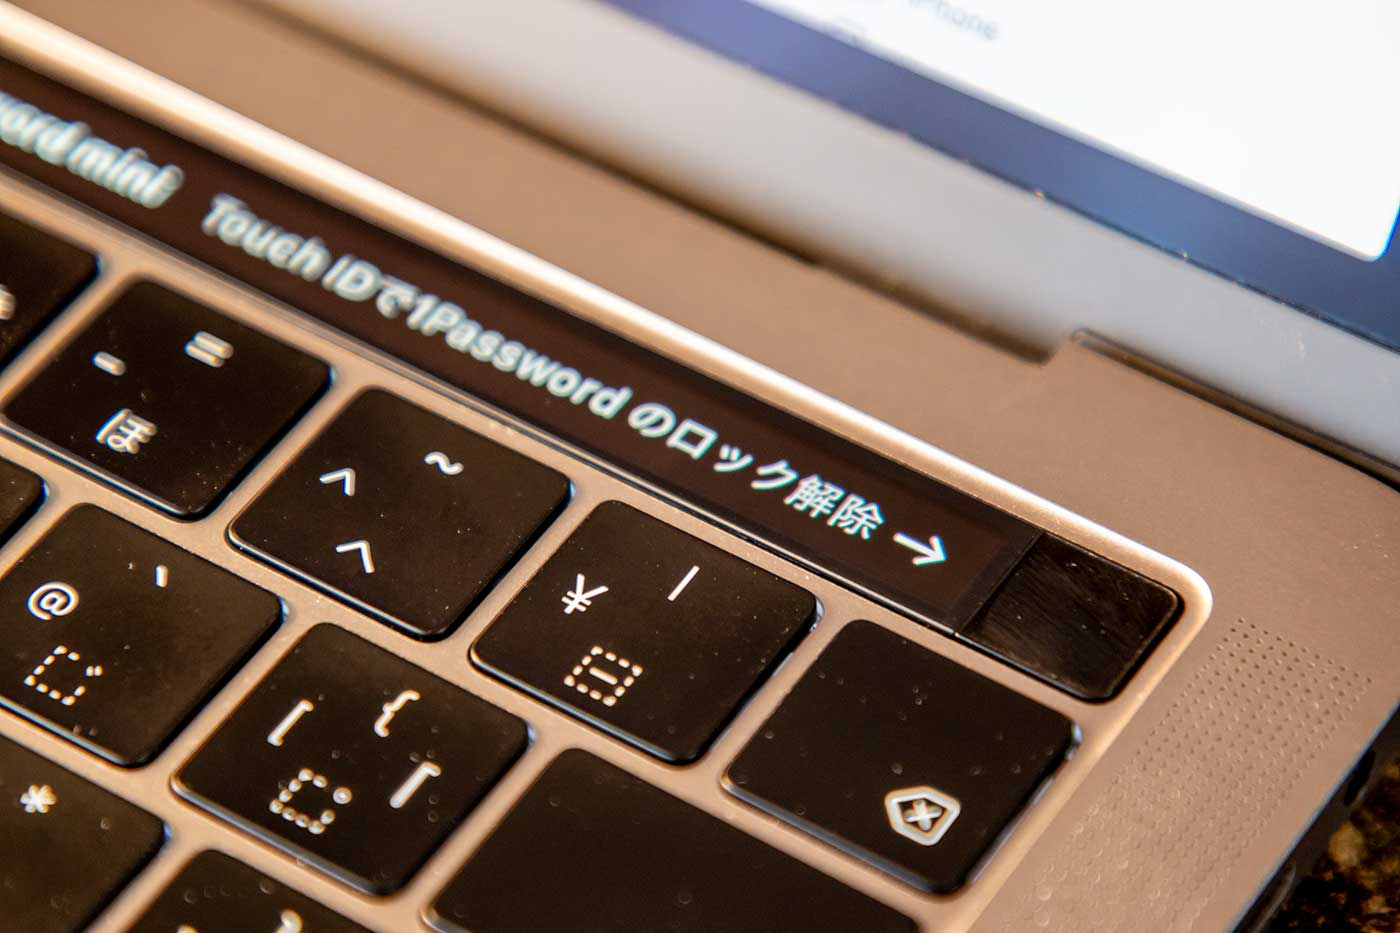 MacBookの指紋認証